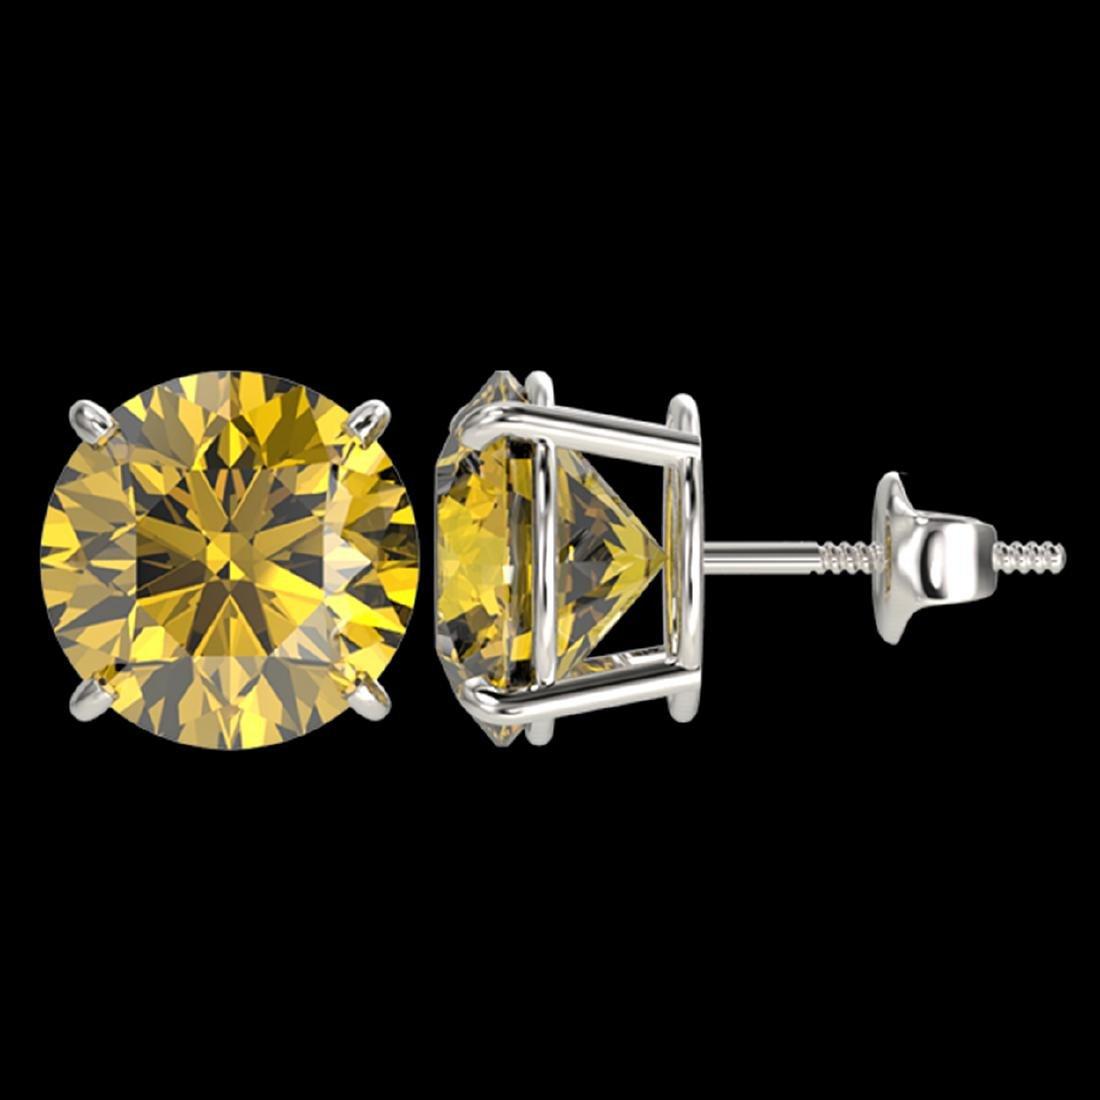 5 ctw Intense Yellow Diamond Stud Earrings 10K White - 2